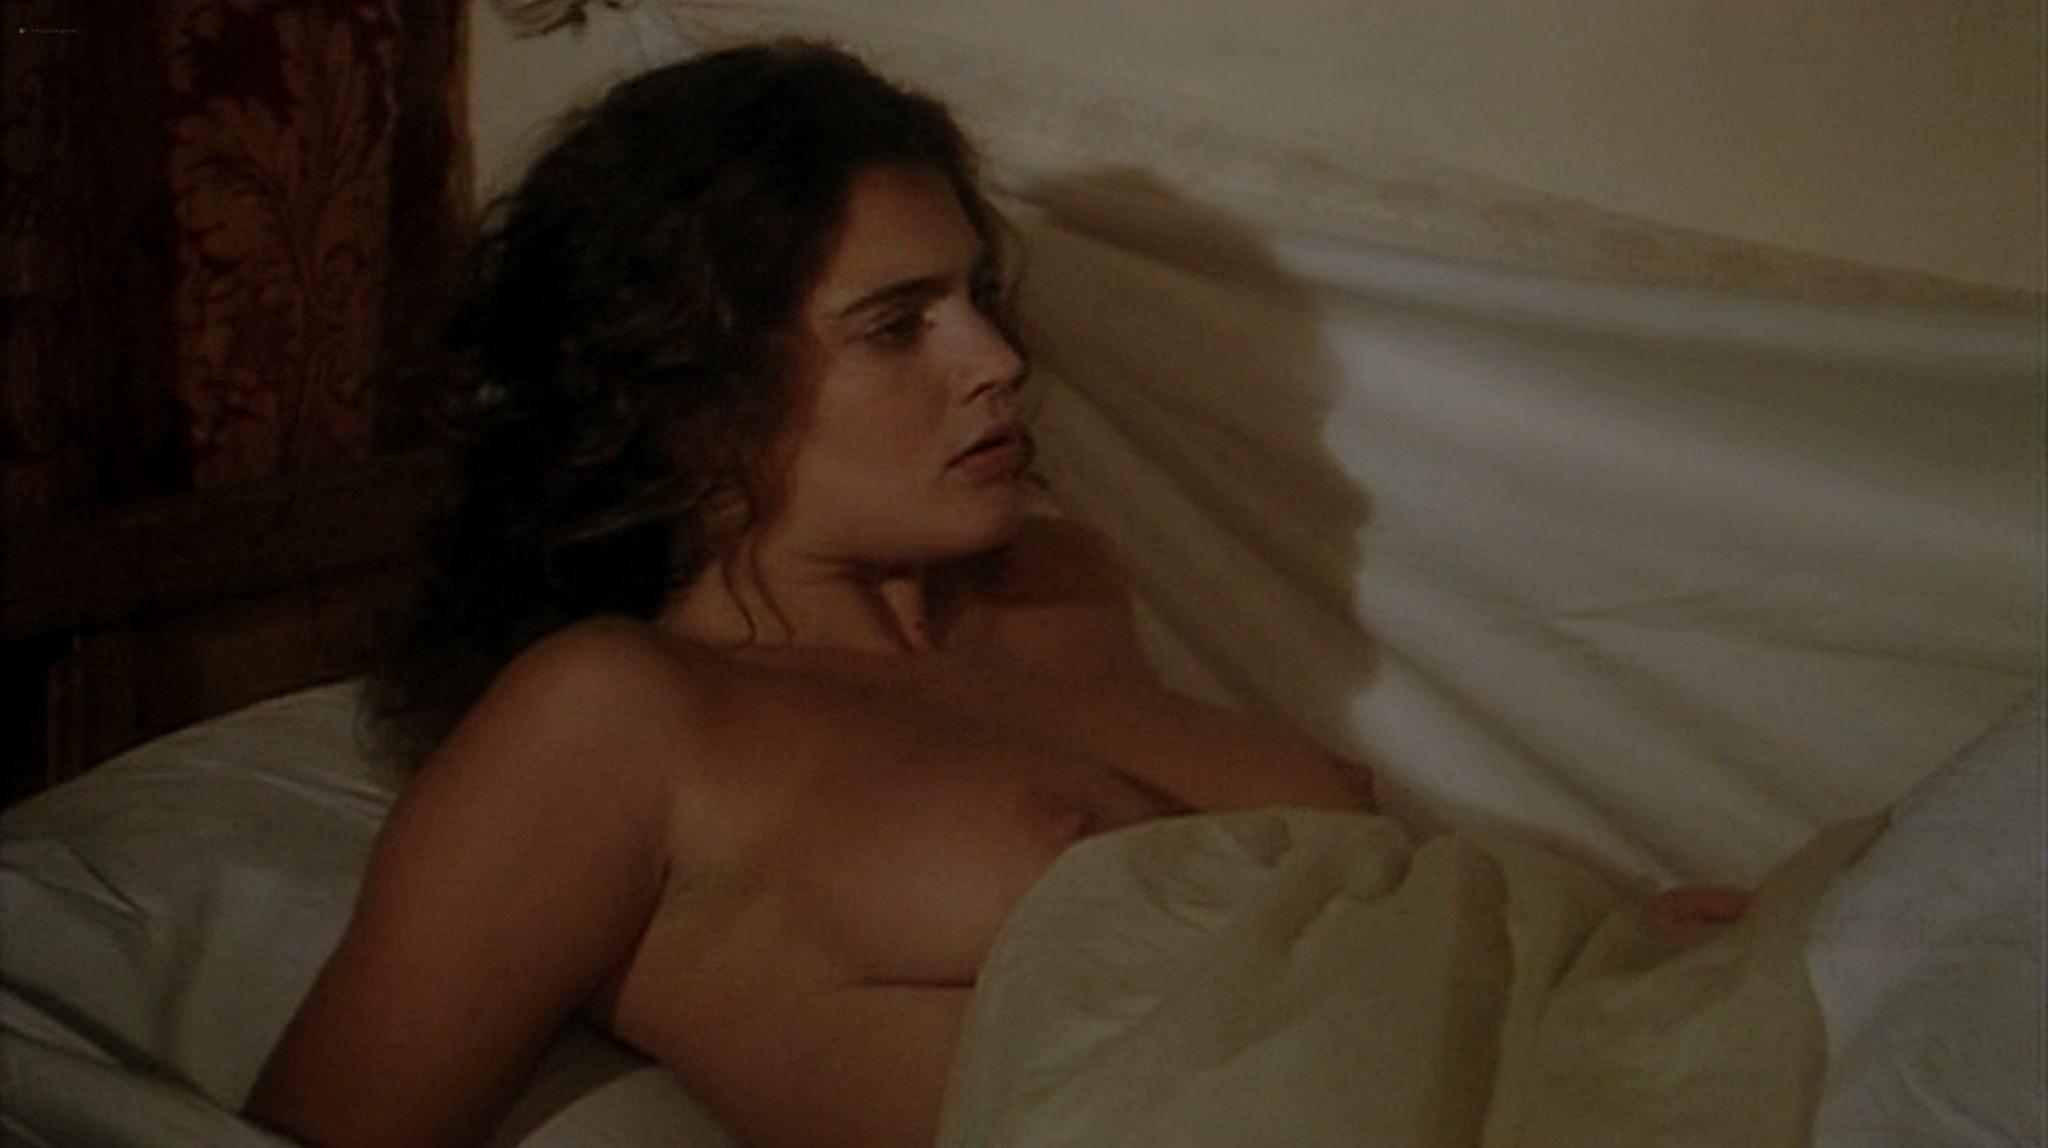 Laura Antonelli nude topless and sex Monica Guerritore nude topless and Clelia Rondinella nude lesbian sex La Venexiana 1986 DVDRip 3